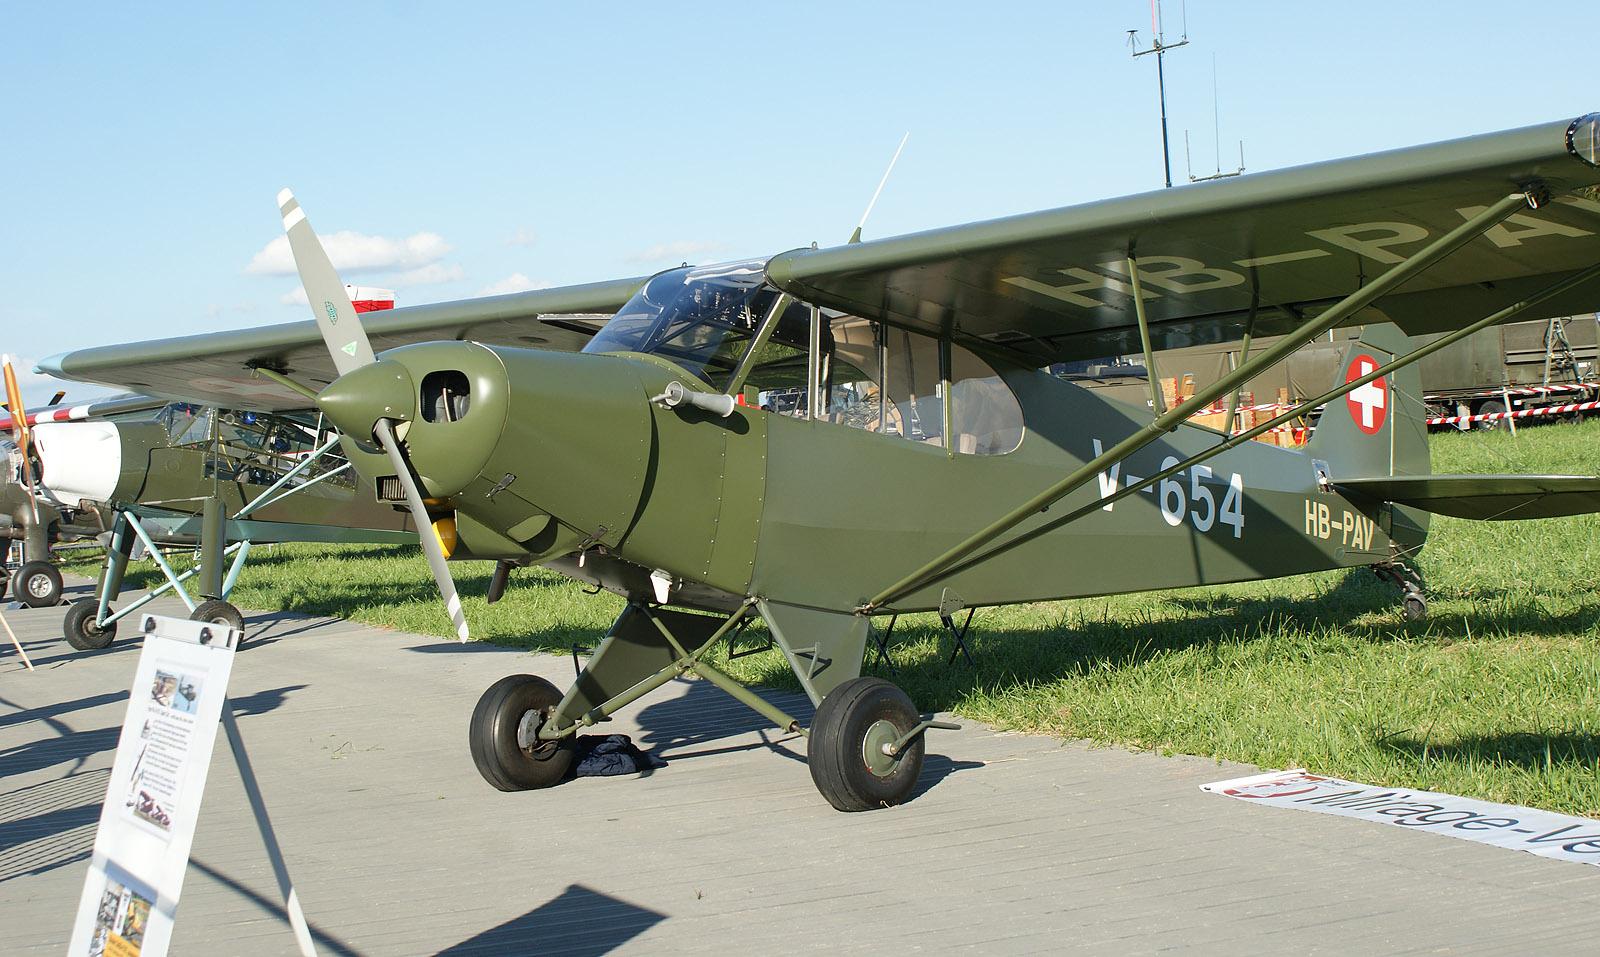 Piper PA-18-150 Super Cub HB-PAV V-654 Swiss Air Force